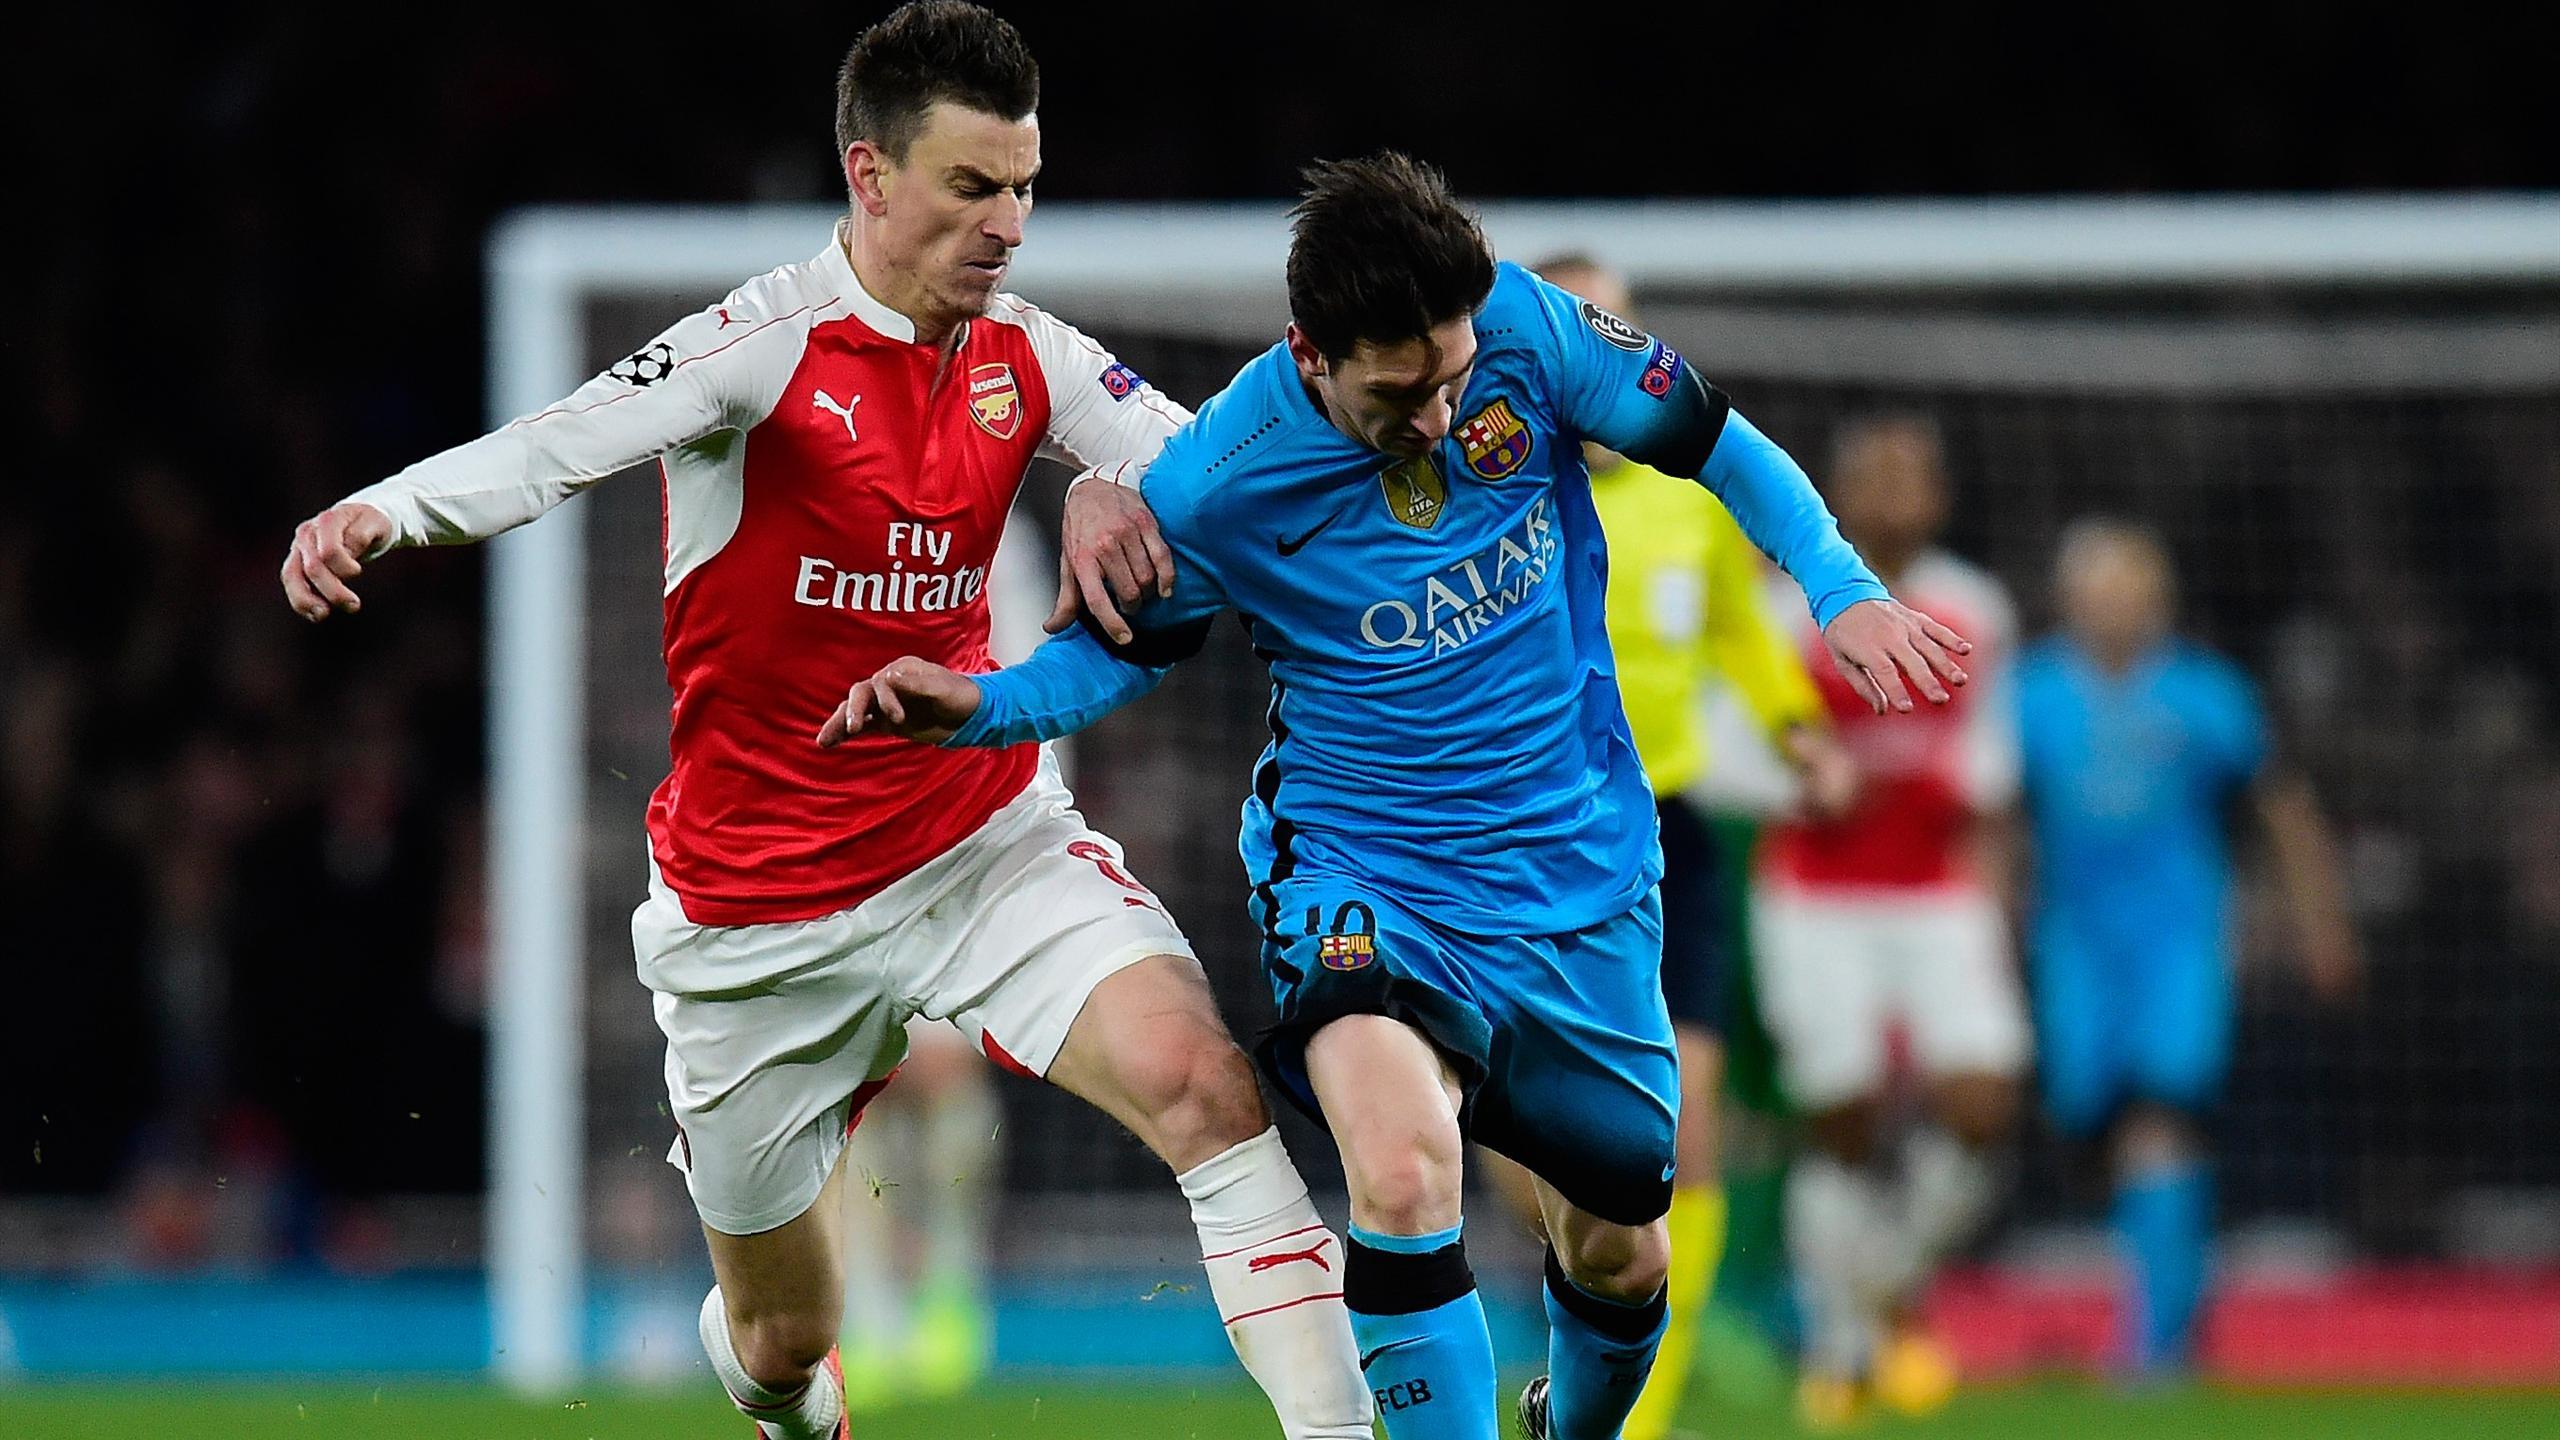 Laurent Koscielny (Arsenal) au duel avec Leo Messi (Barça)